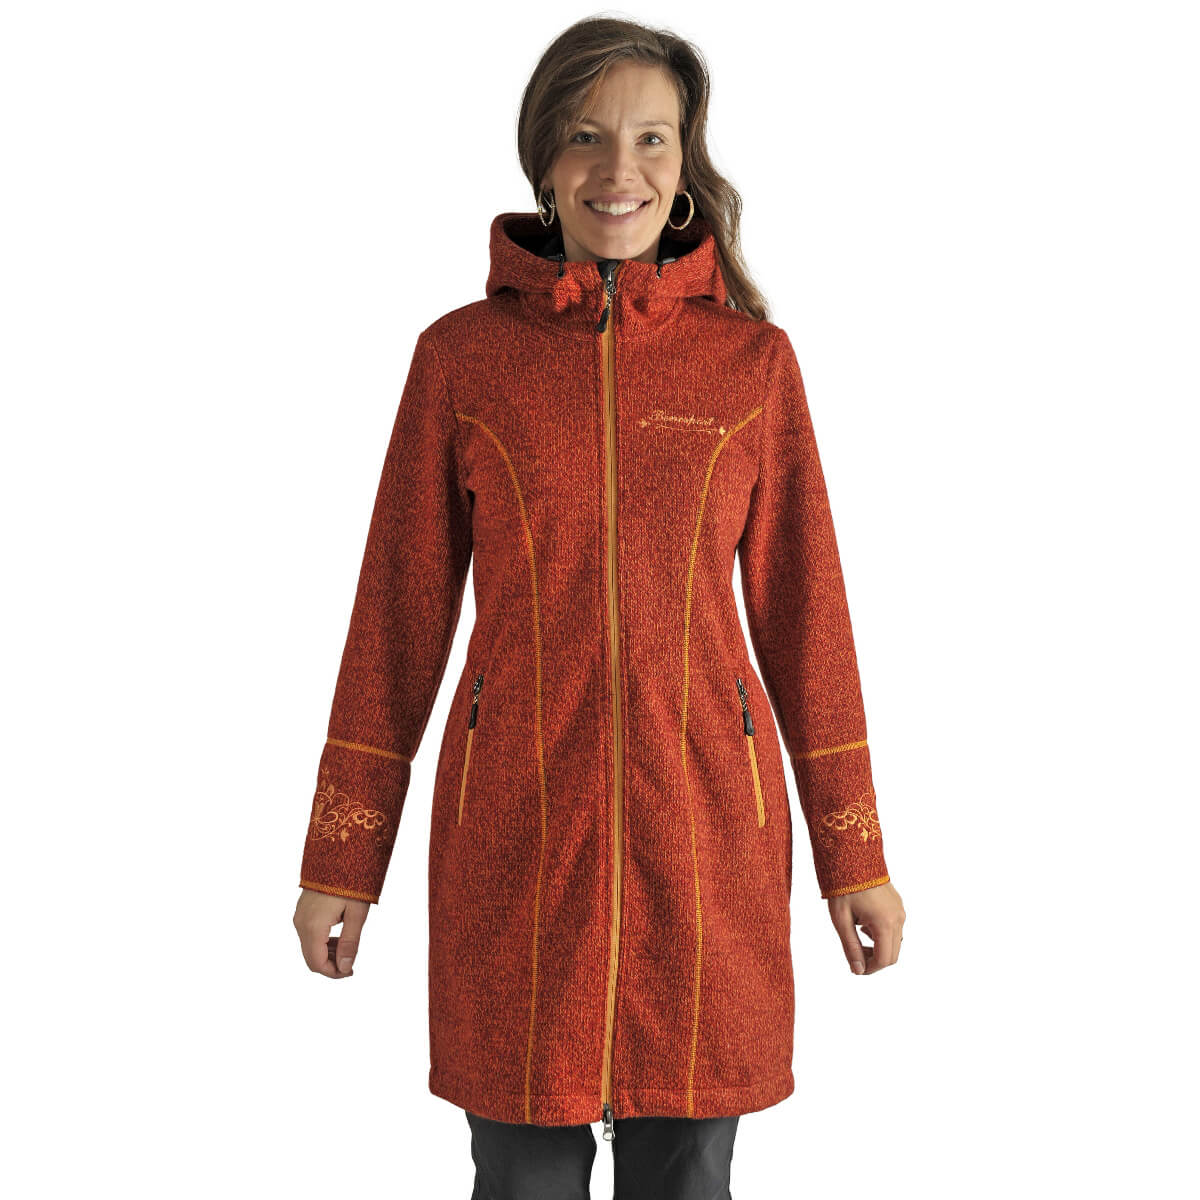 Benesport dámska bunda Pekelník - oranžová, veľkosť XS